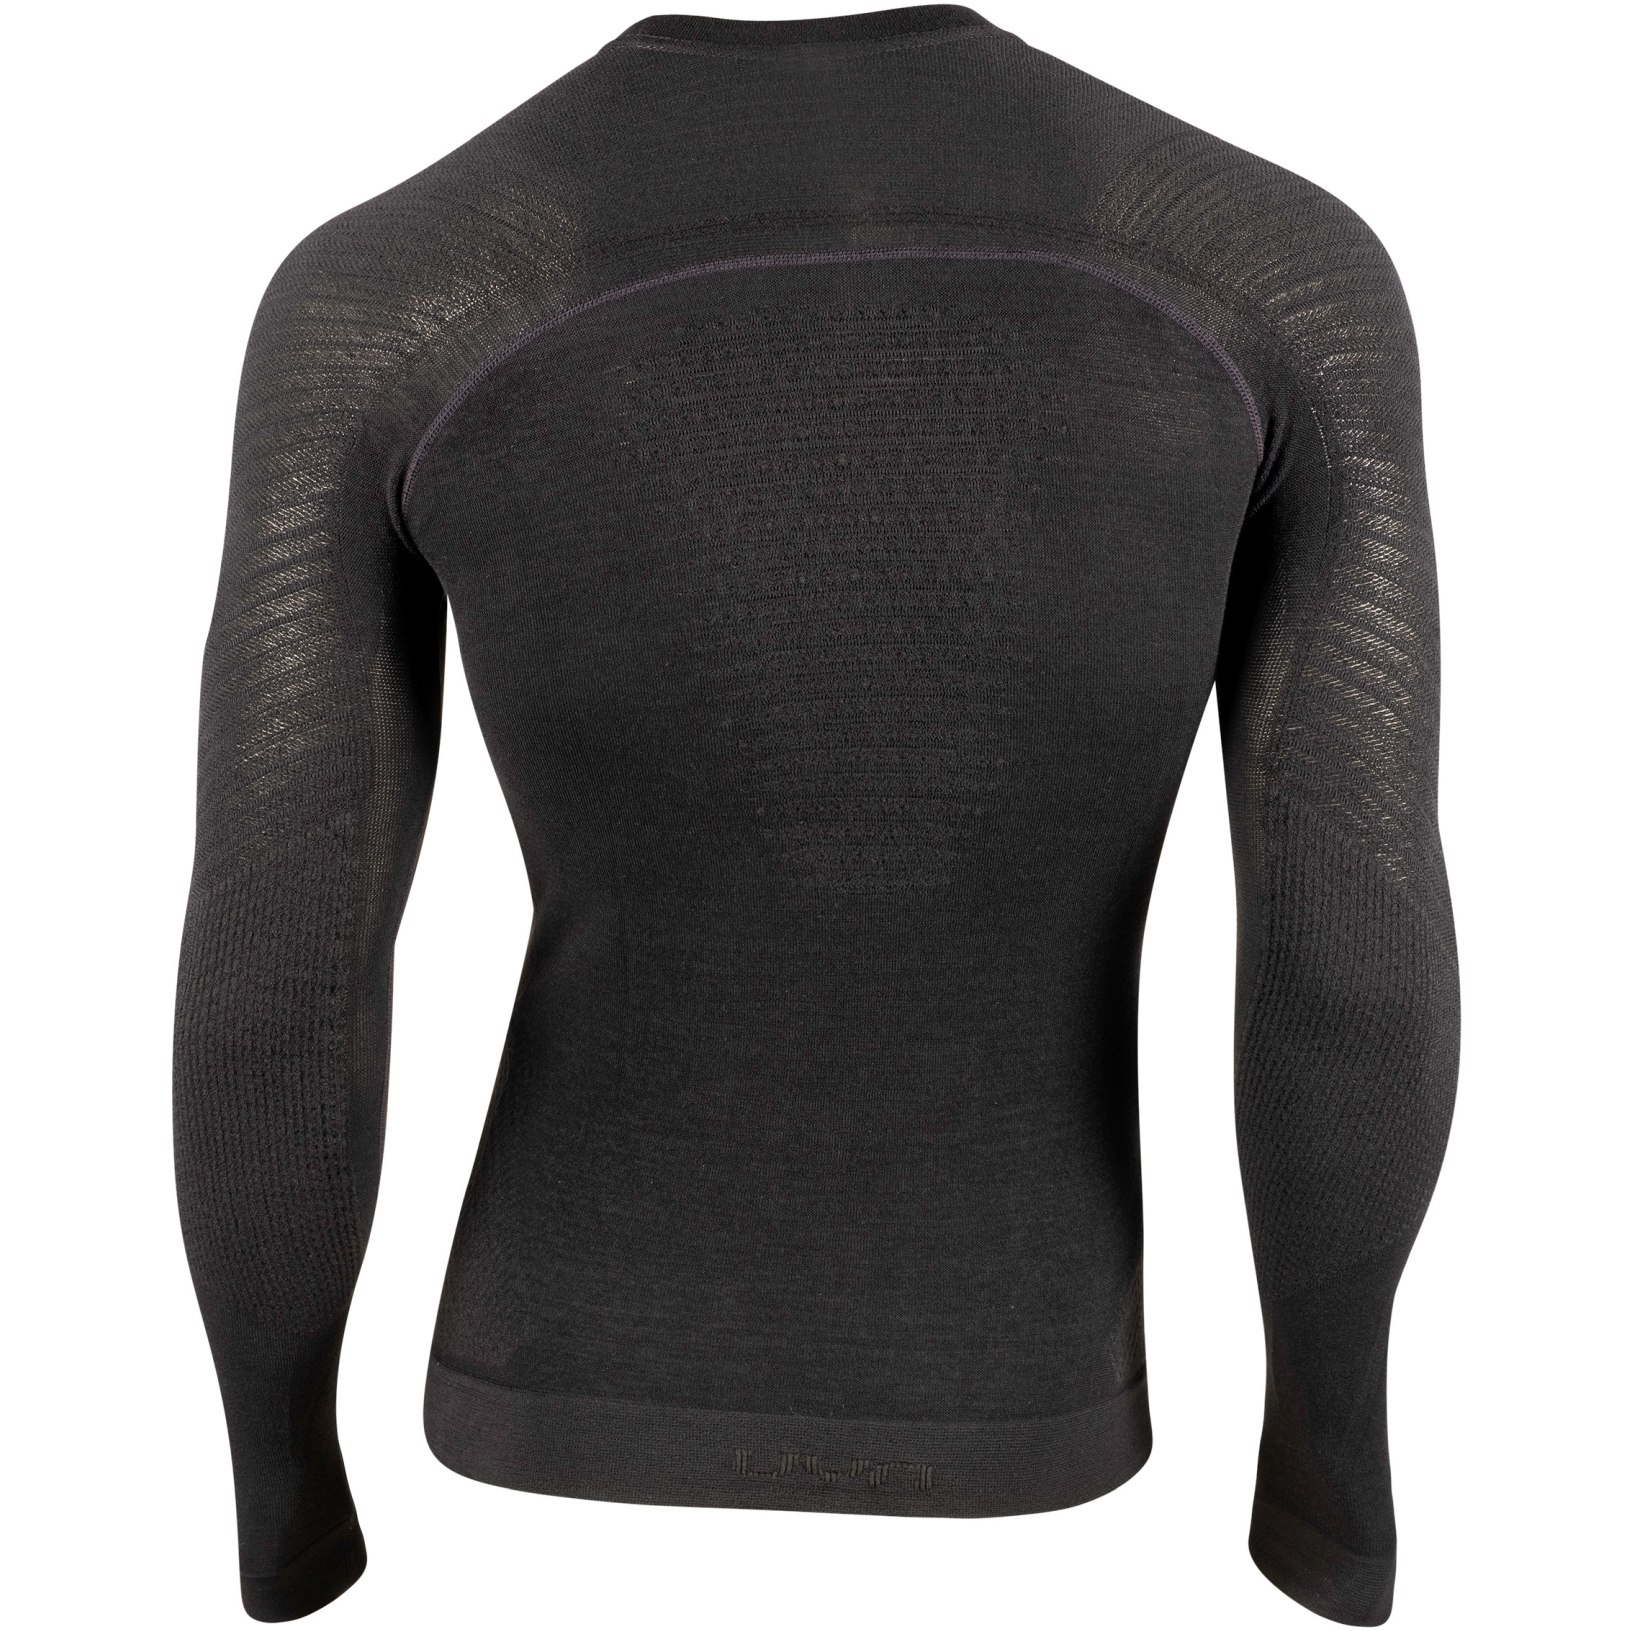 Image of UYN Fusyon Man Cashmere UW Long Sleeve Shirt - Black/Black